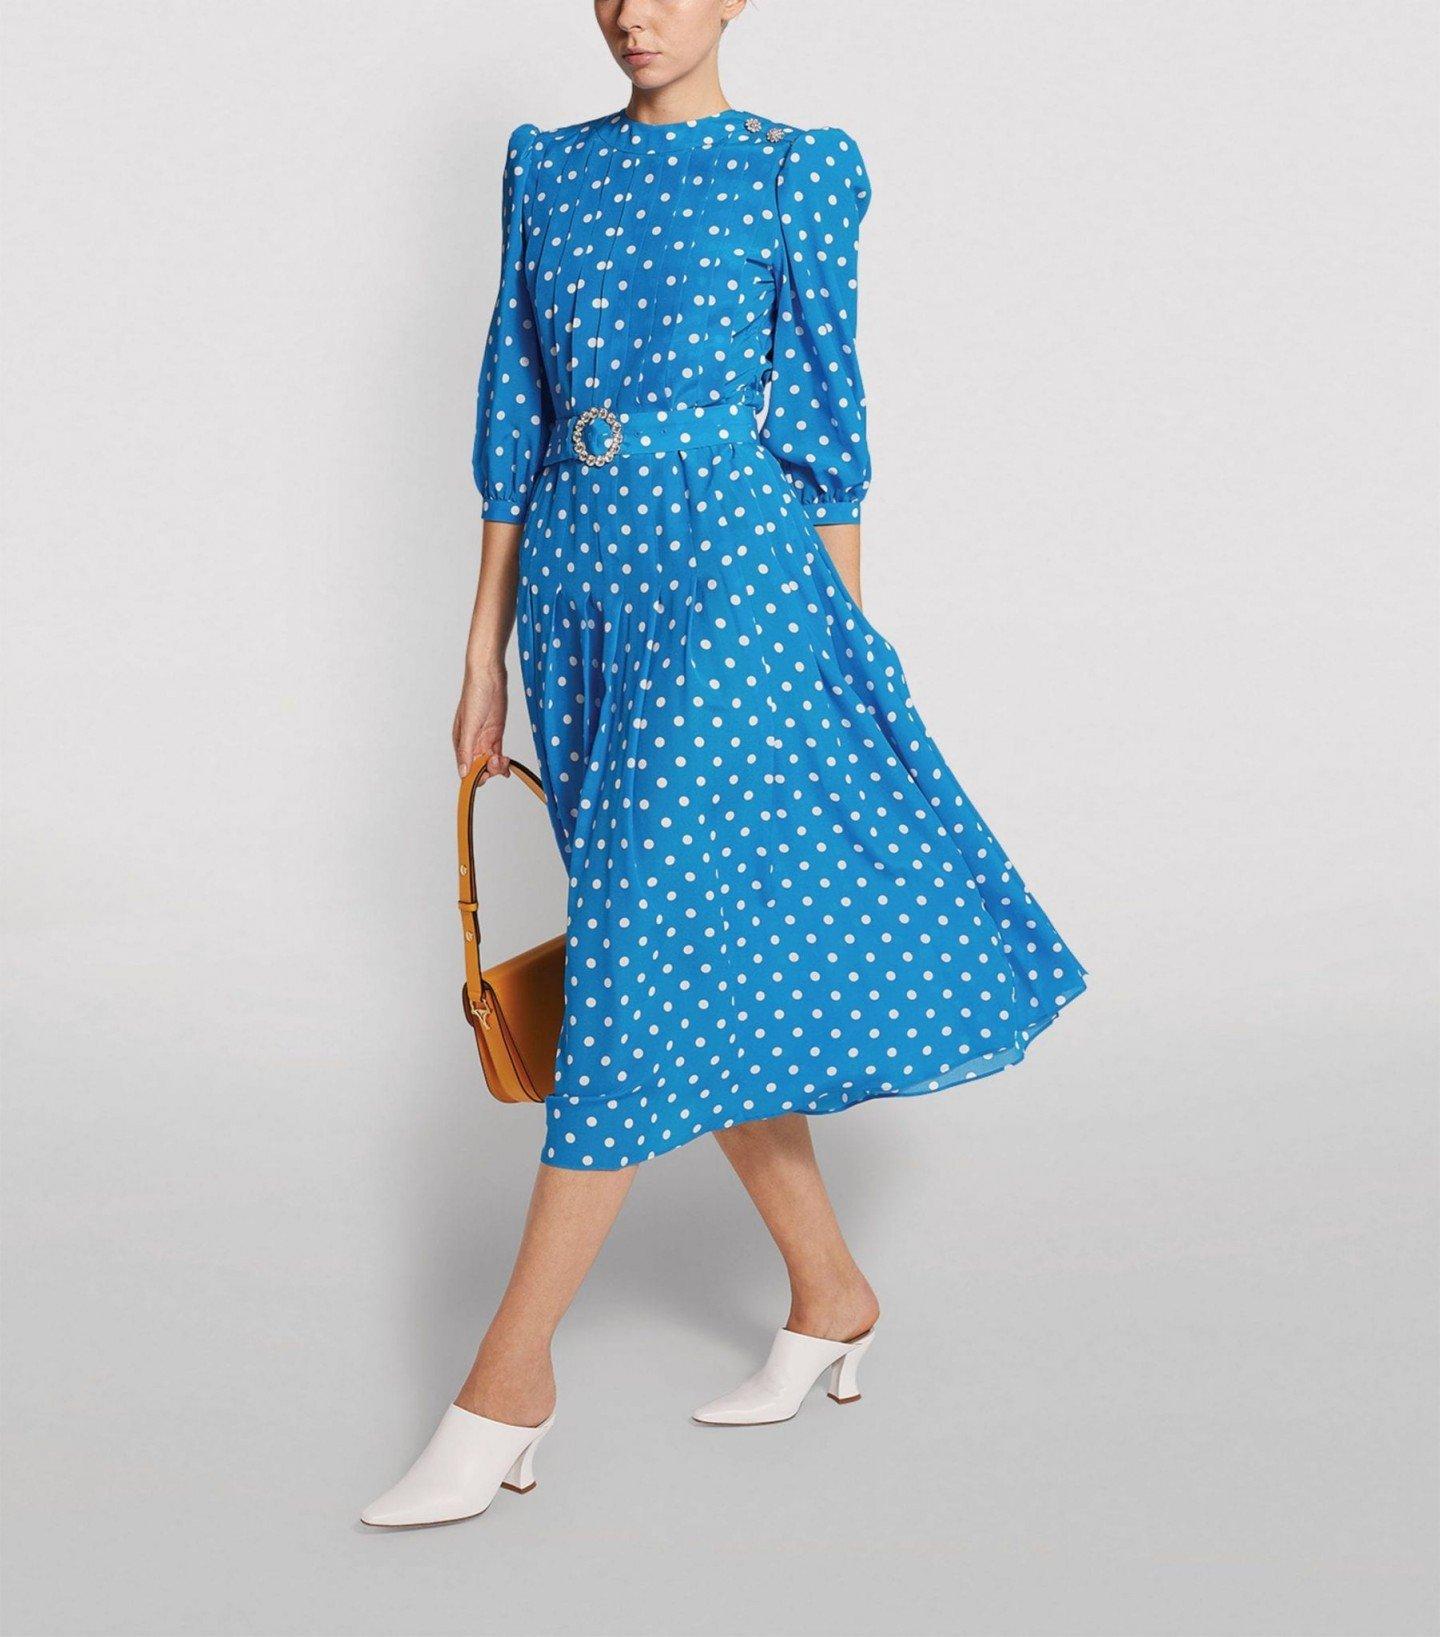 ALESSANDRA RICH Polka-Dot Pleated Midi Dress